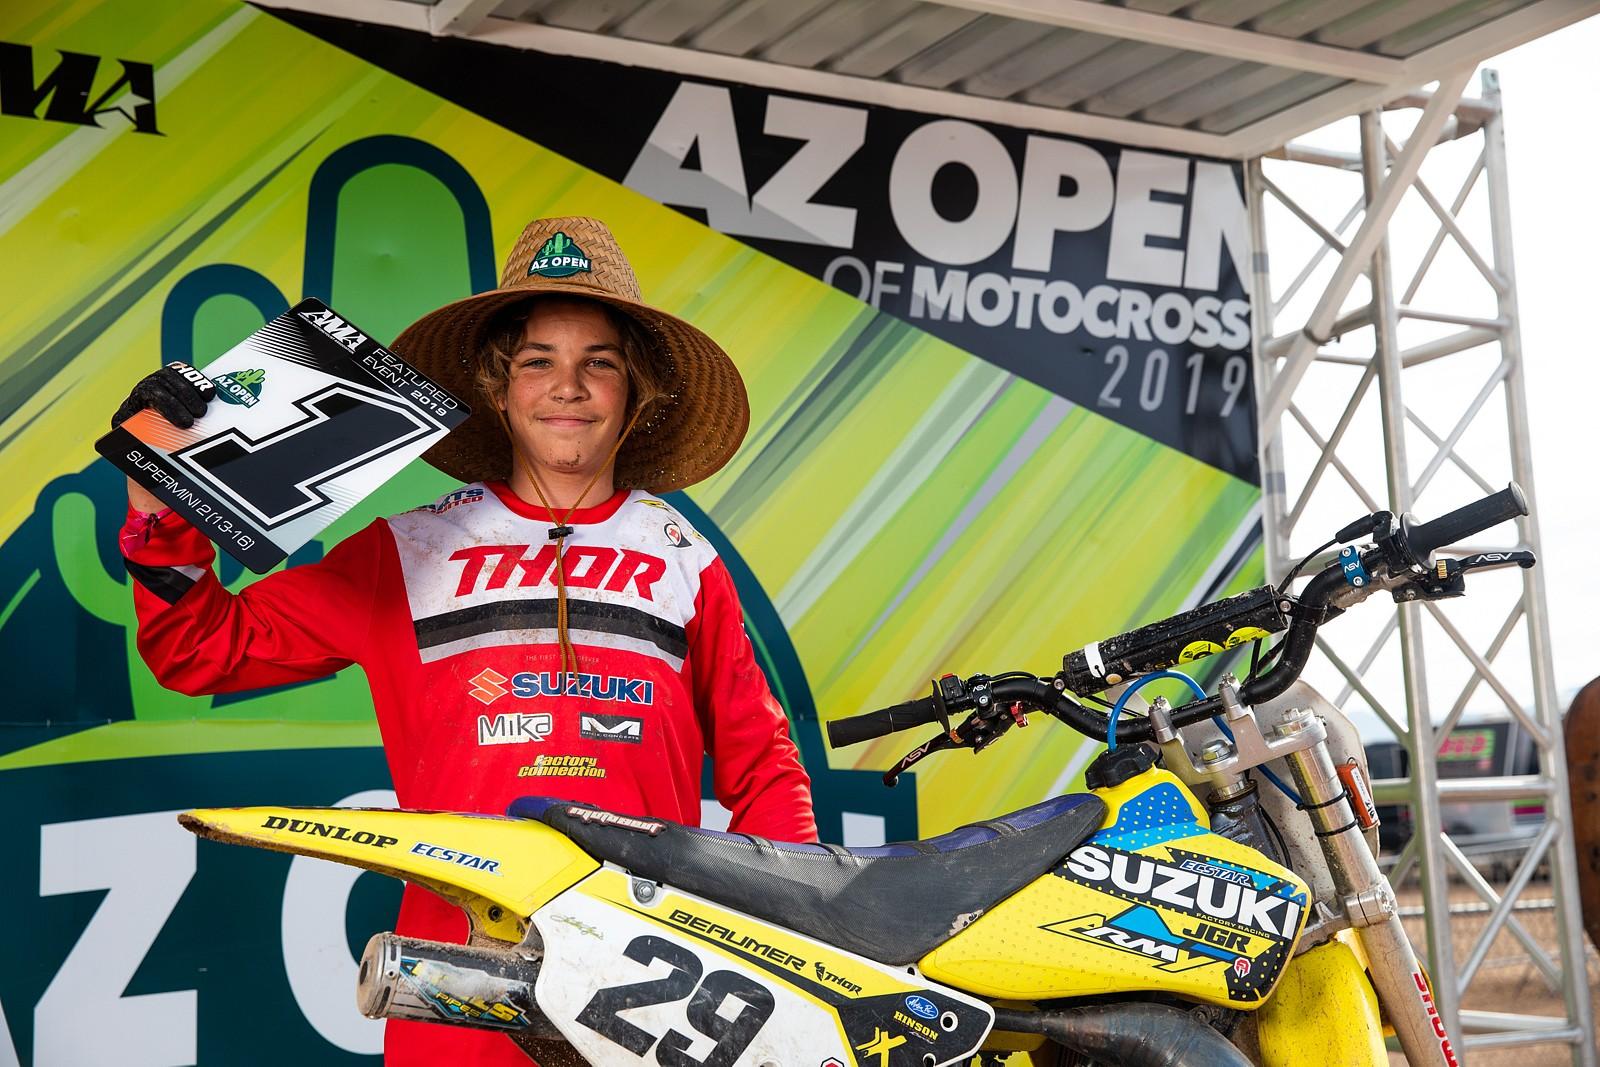 Julien Beaumer - AZ Open of Motocross, Part 2 - Motocross Pictures - Vital MX